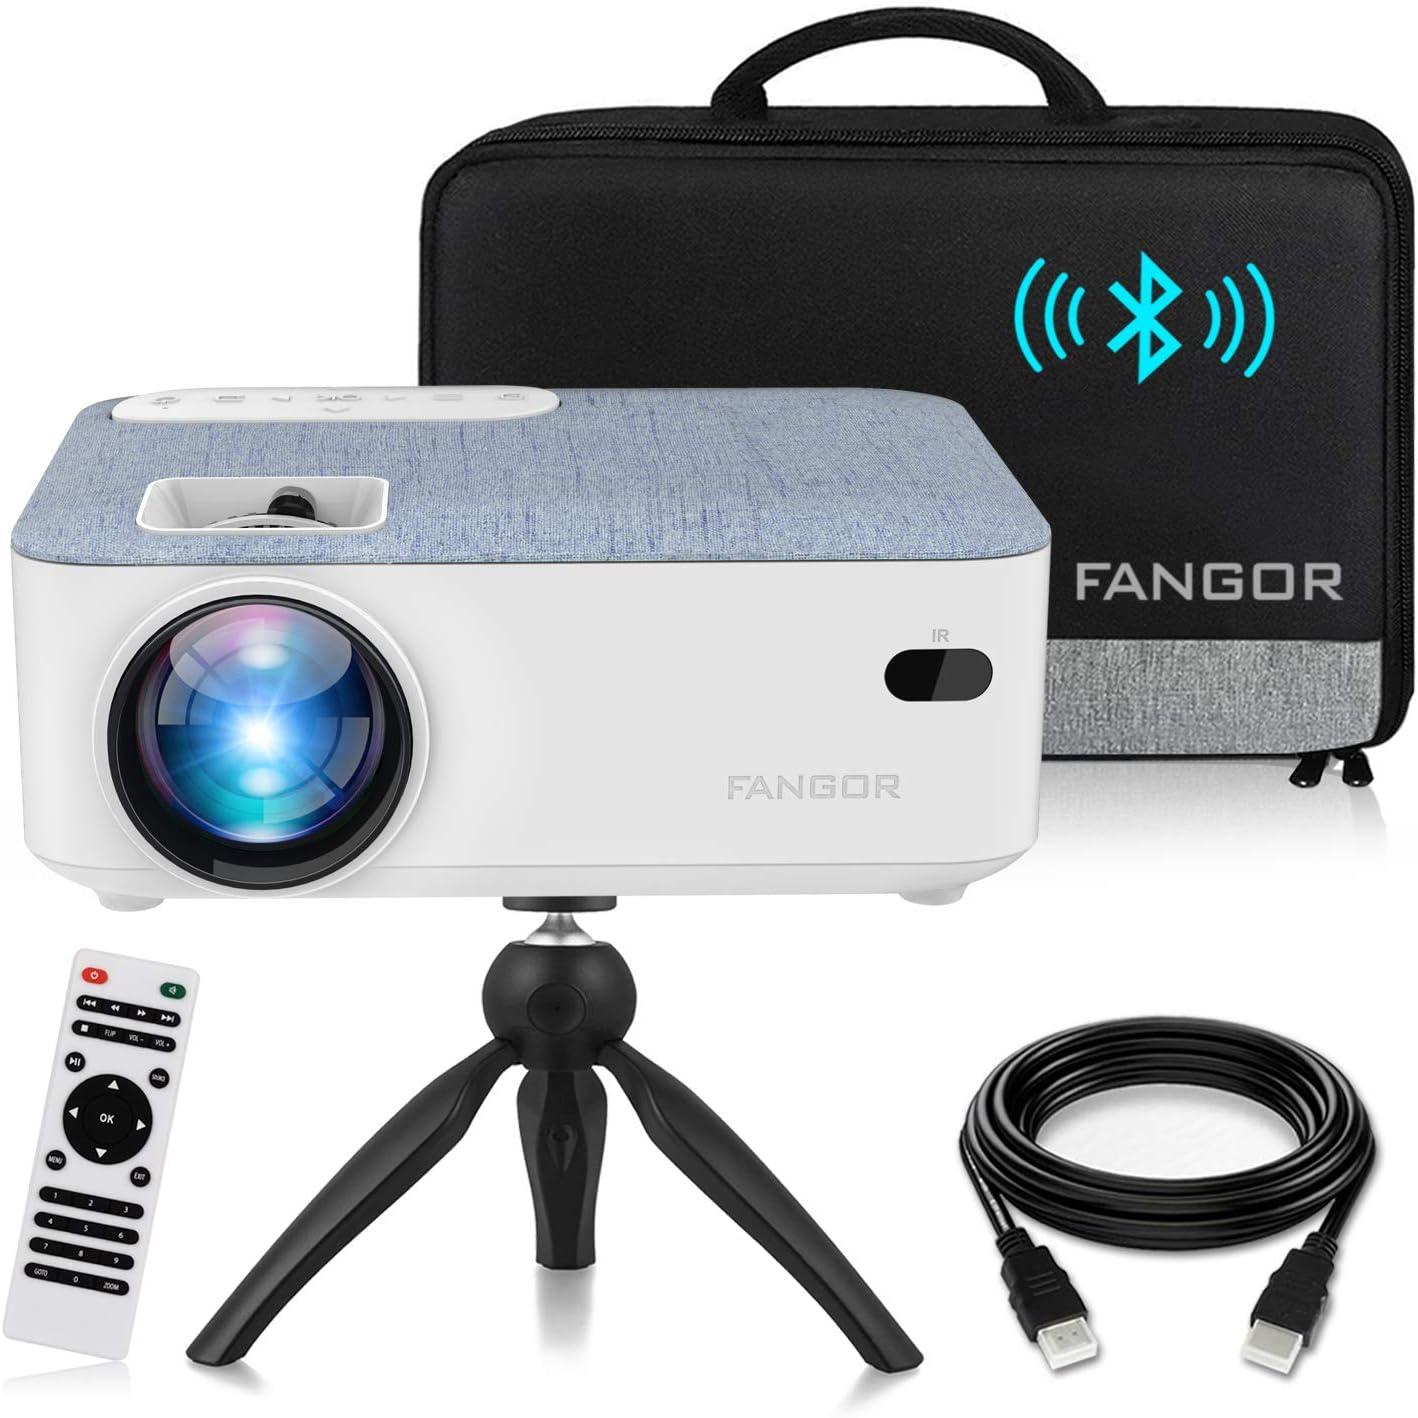 Max 77% OFF FANGOR HD Bluetooth Projector 2021 LCD upgraded Projec Portable Max 51% OFF